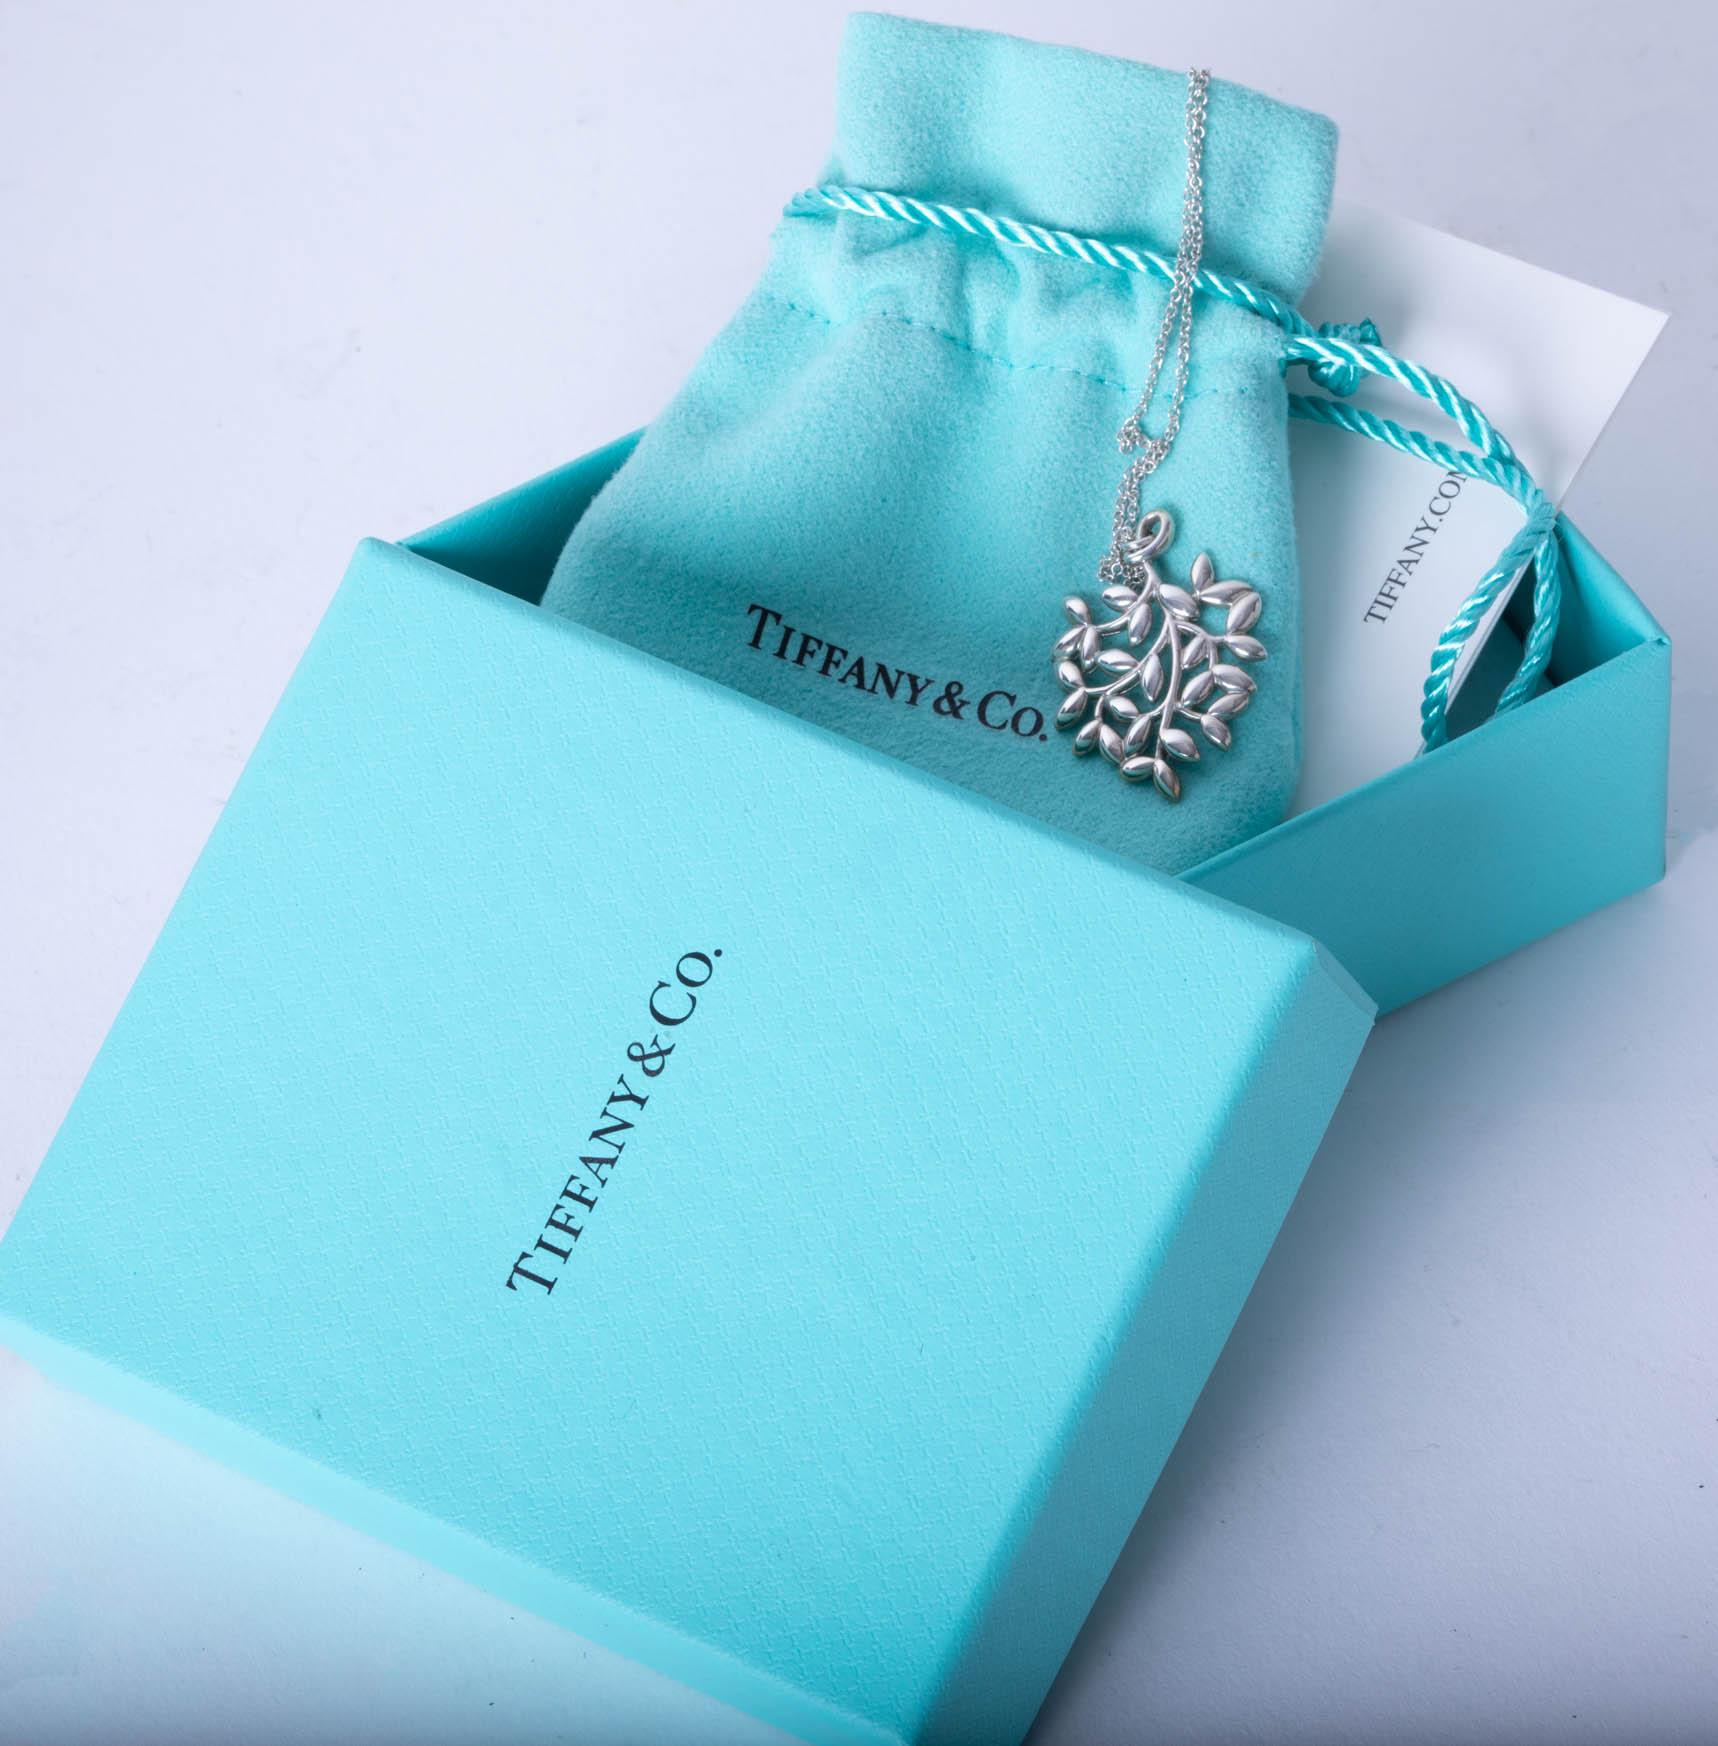 Lot 020 - A silver Tiffany & Co pendant, boxed.